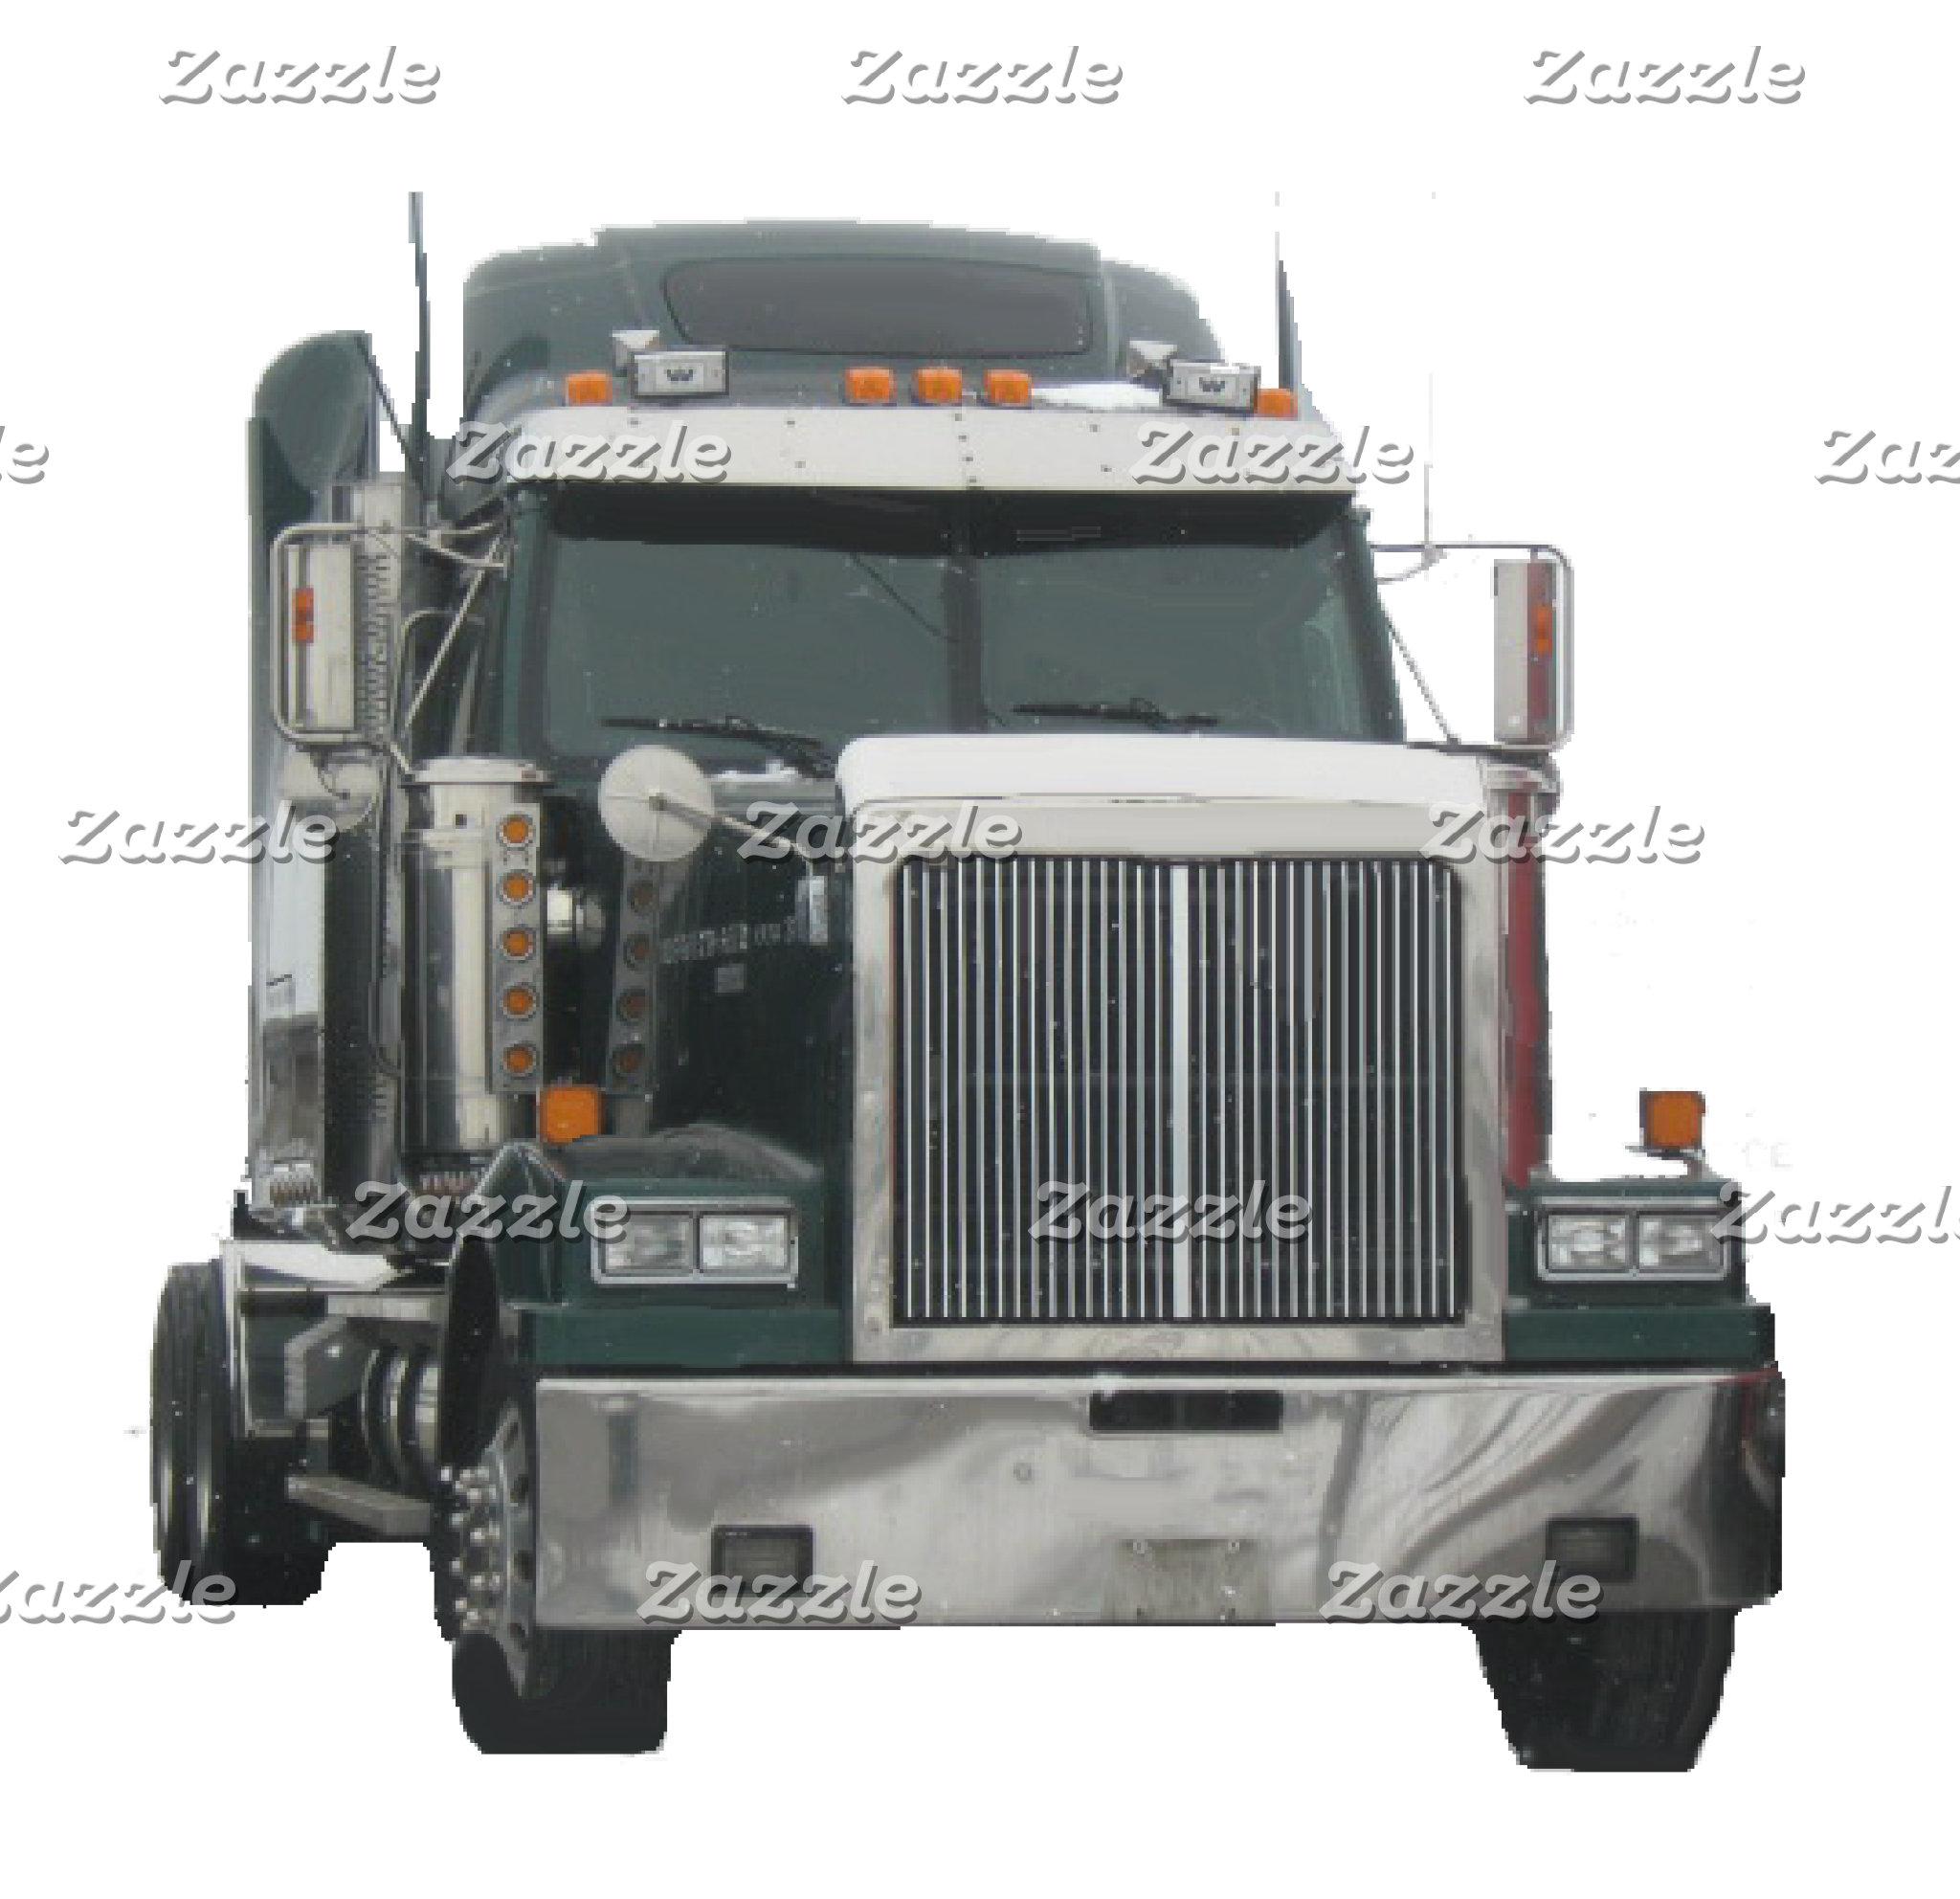 18 Wheeler Truck Tractor  122 items,